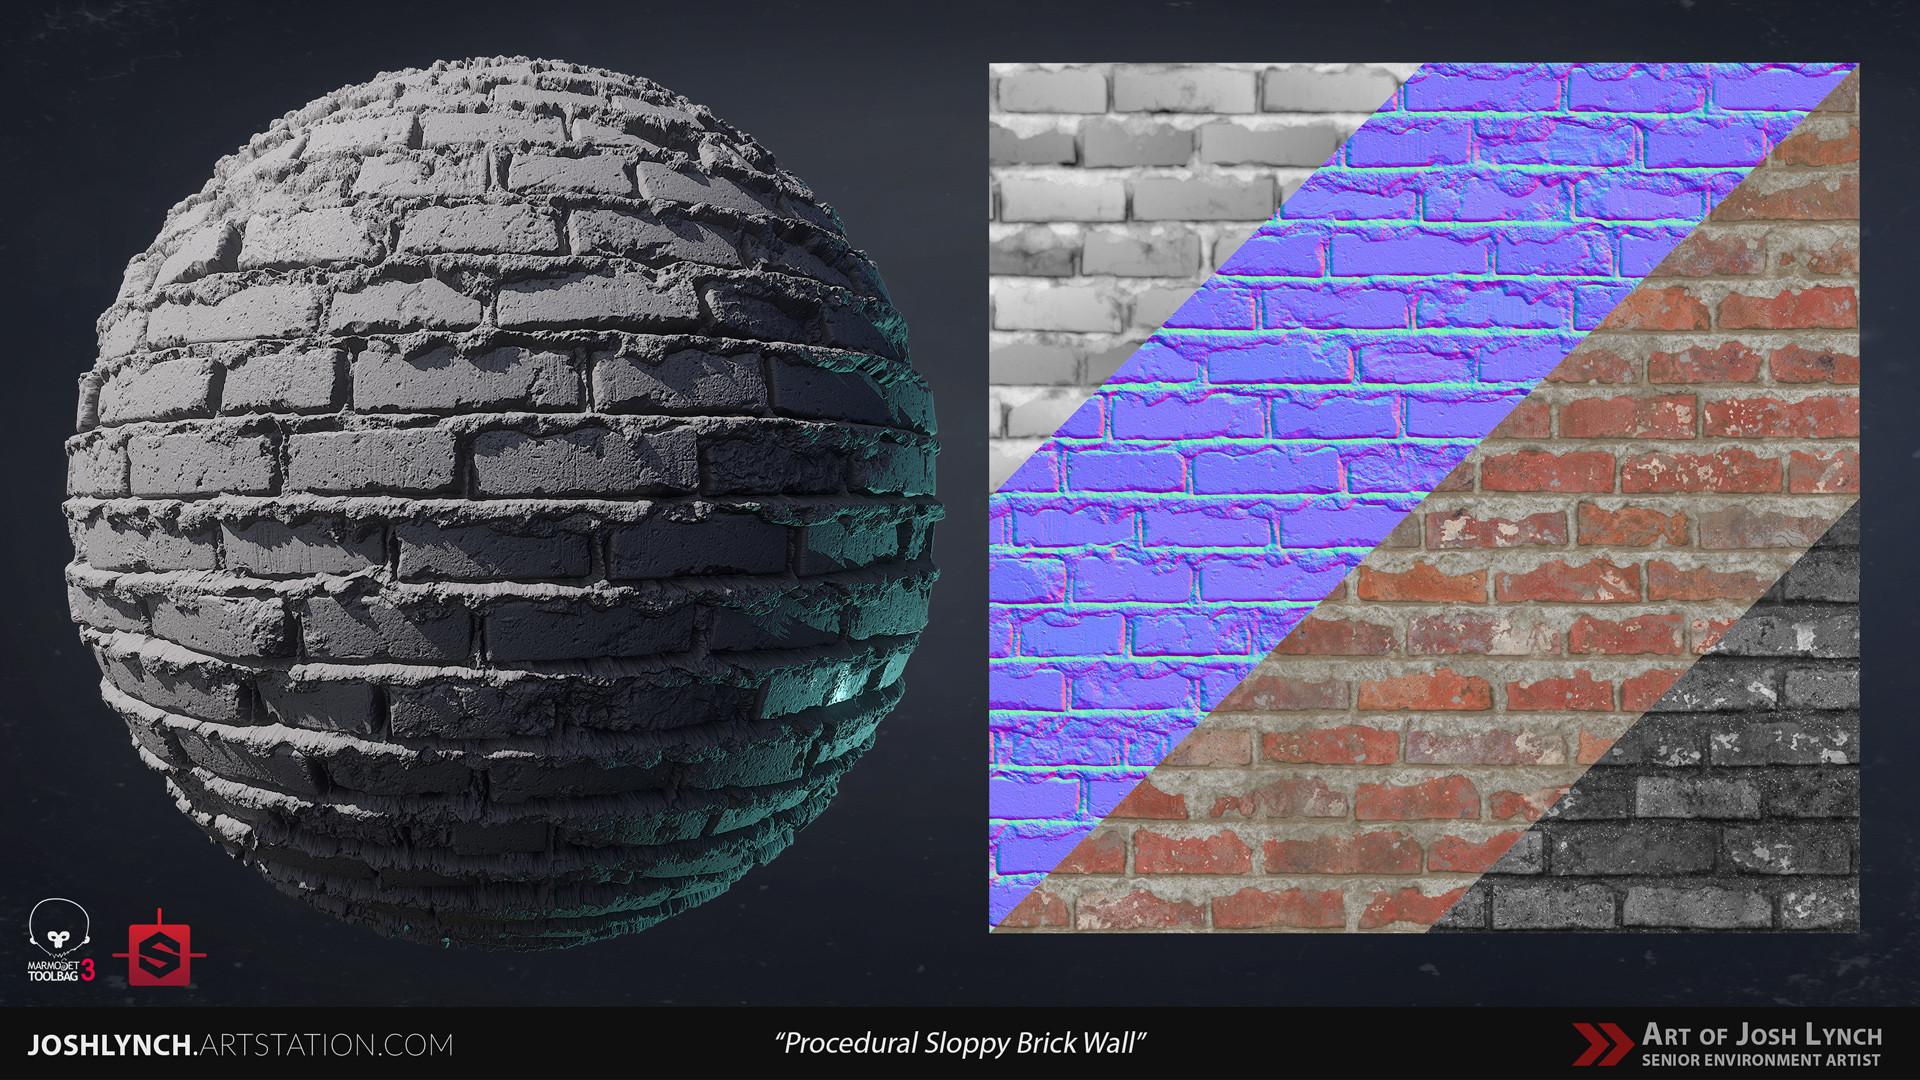 Joshua lynch wall brick sloppy 02 comp sphere 01 gray